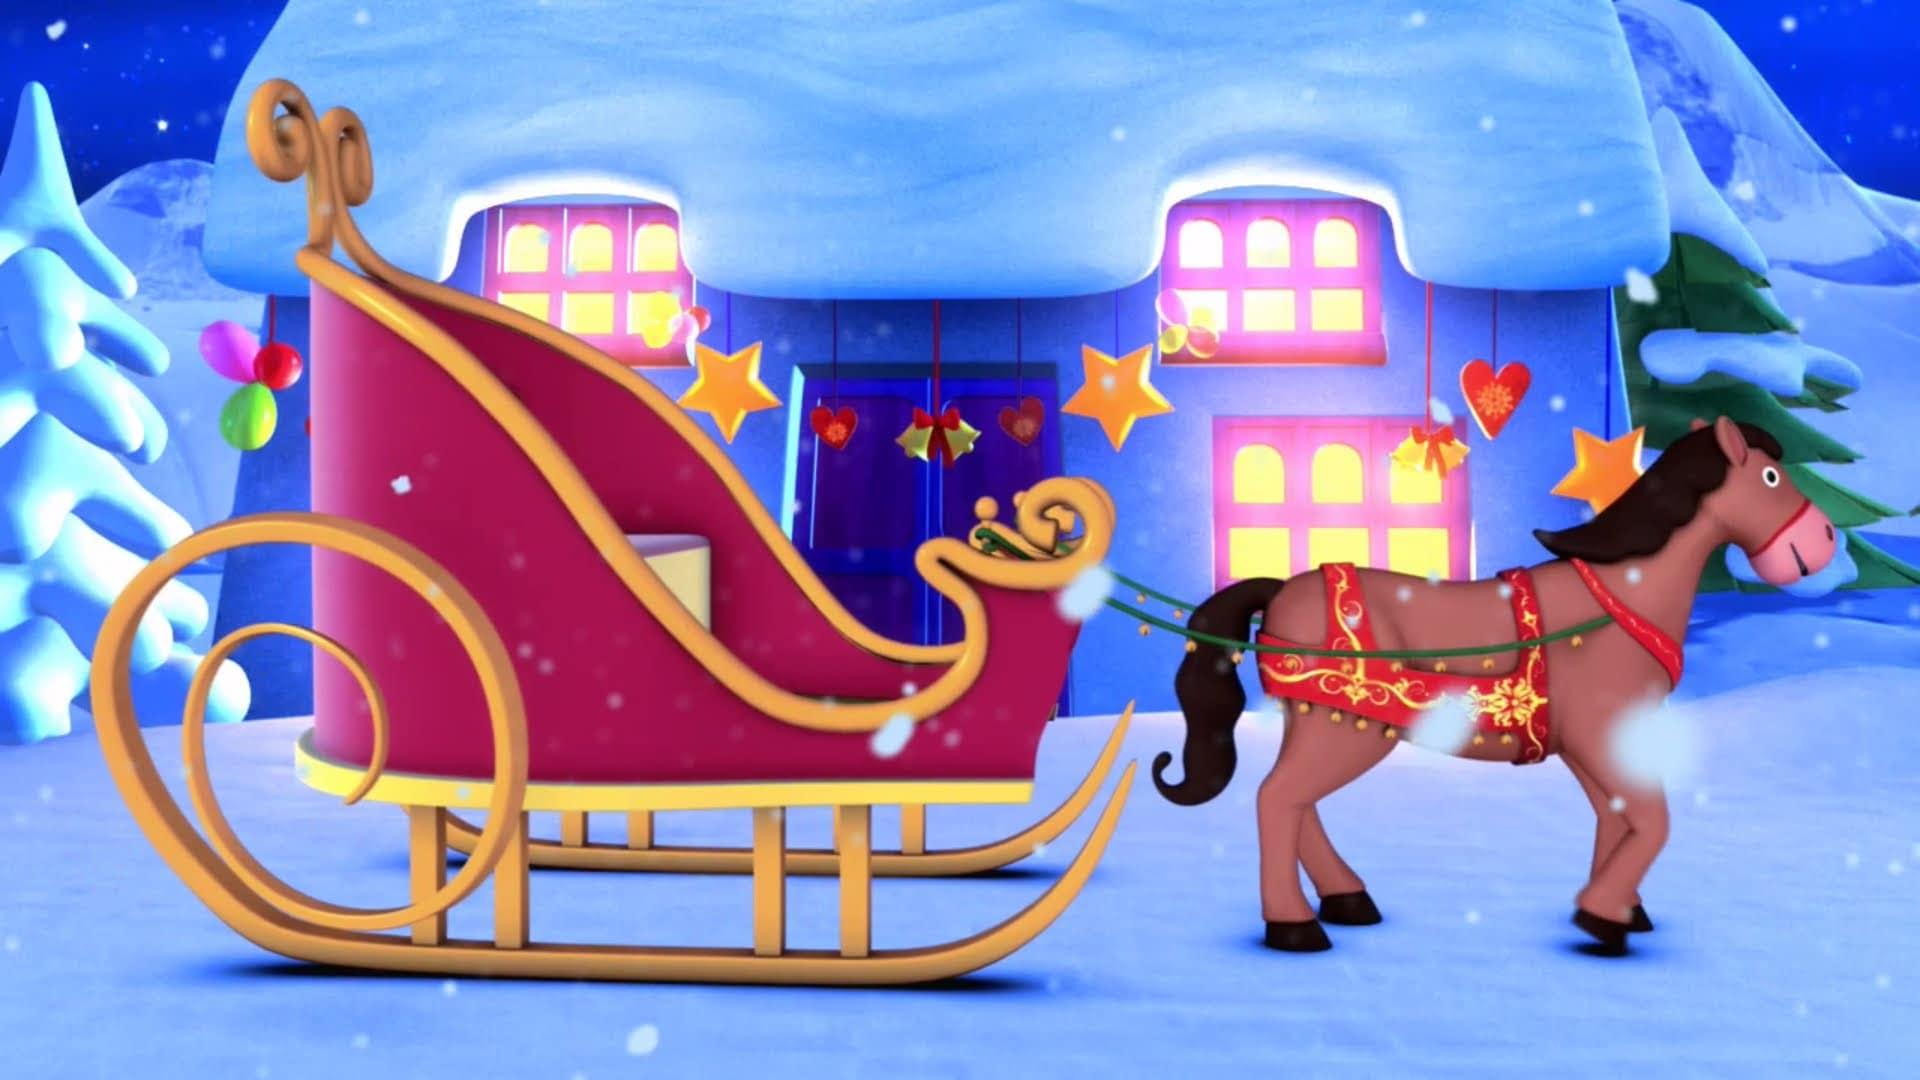 Christmas Countdown ~ 18 Days! Sing along Jingle Bells - Homestead ...